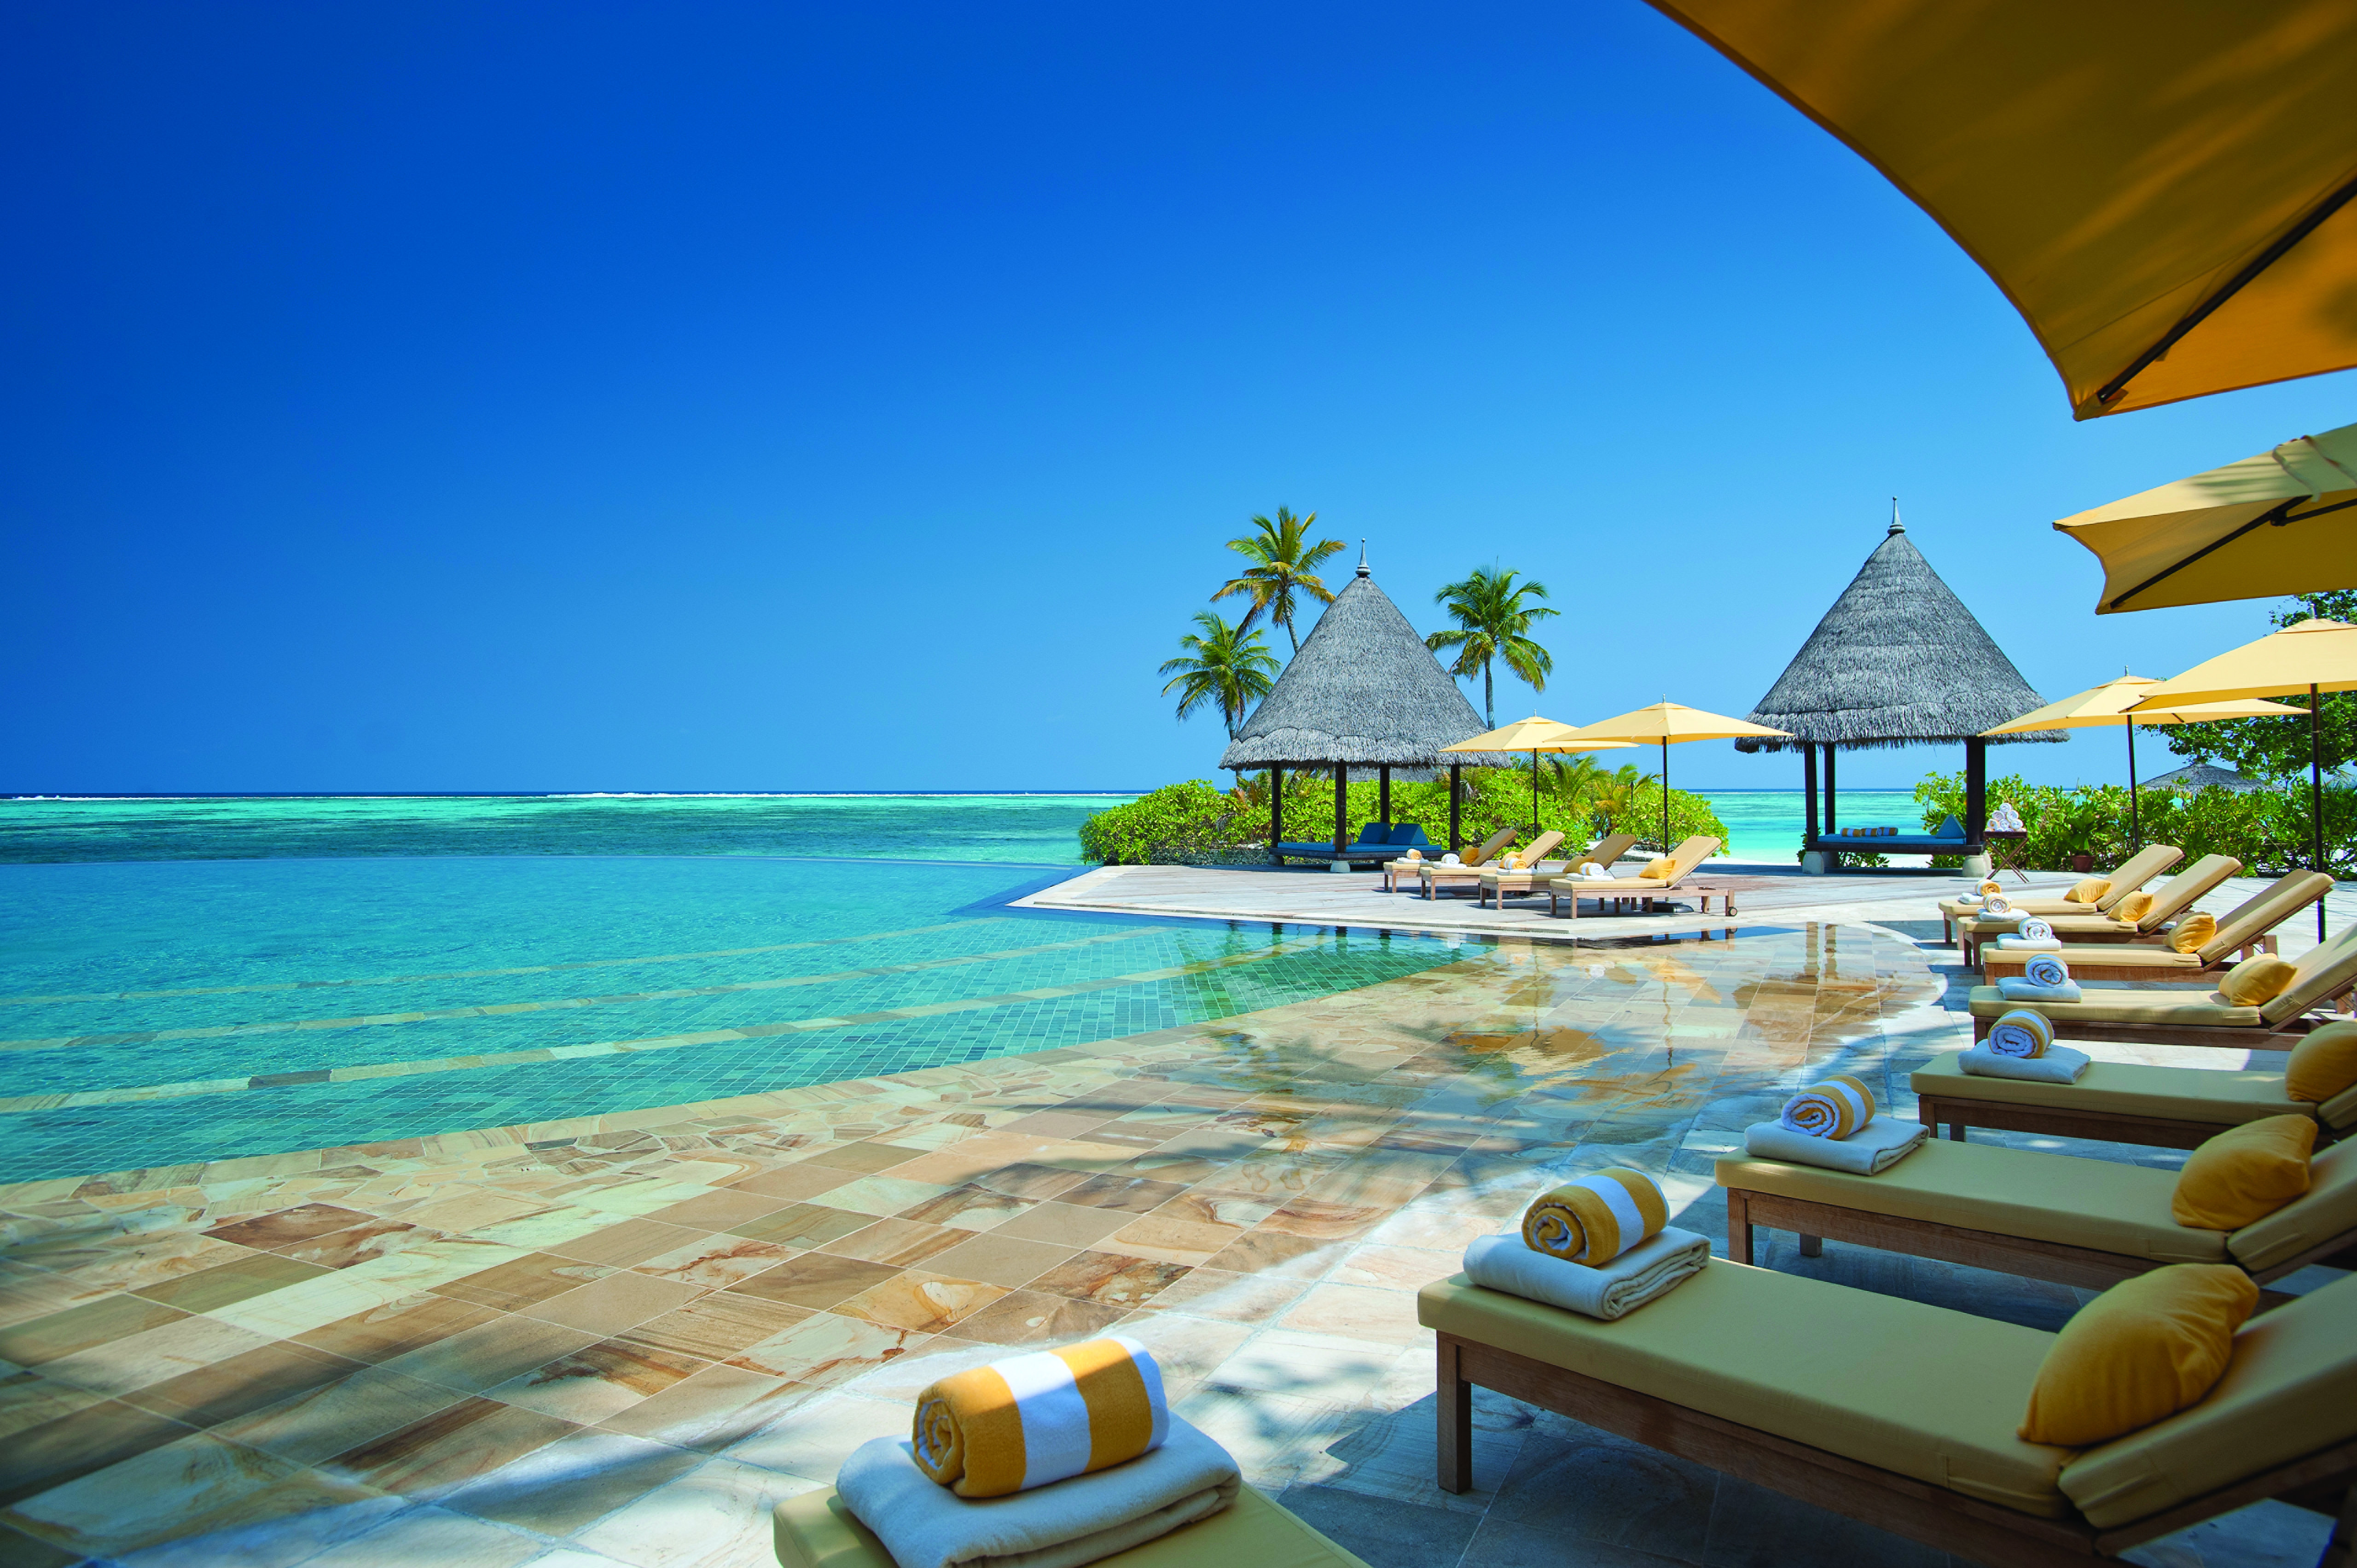 Four-Seasons-Maldives-Kuda-Huraa